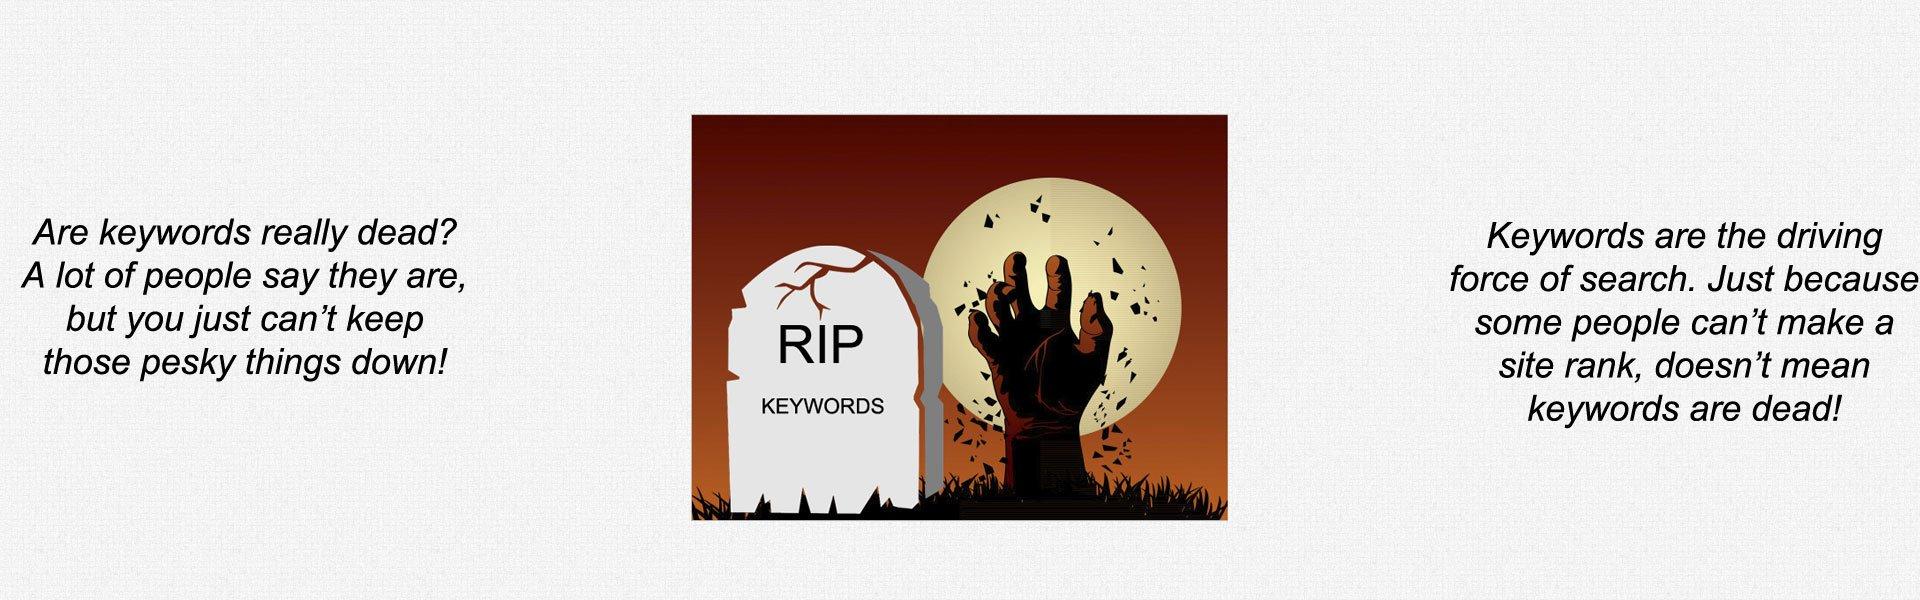 Are keywords really dead?